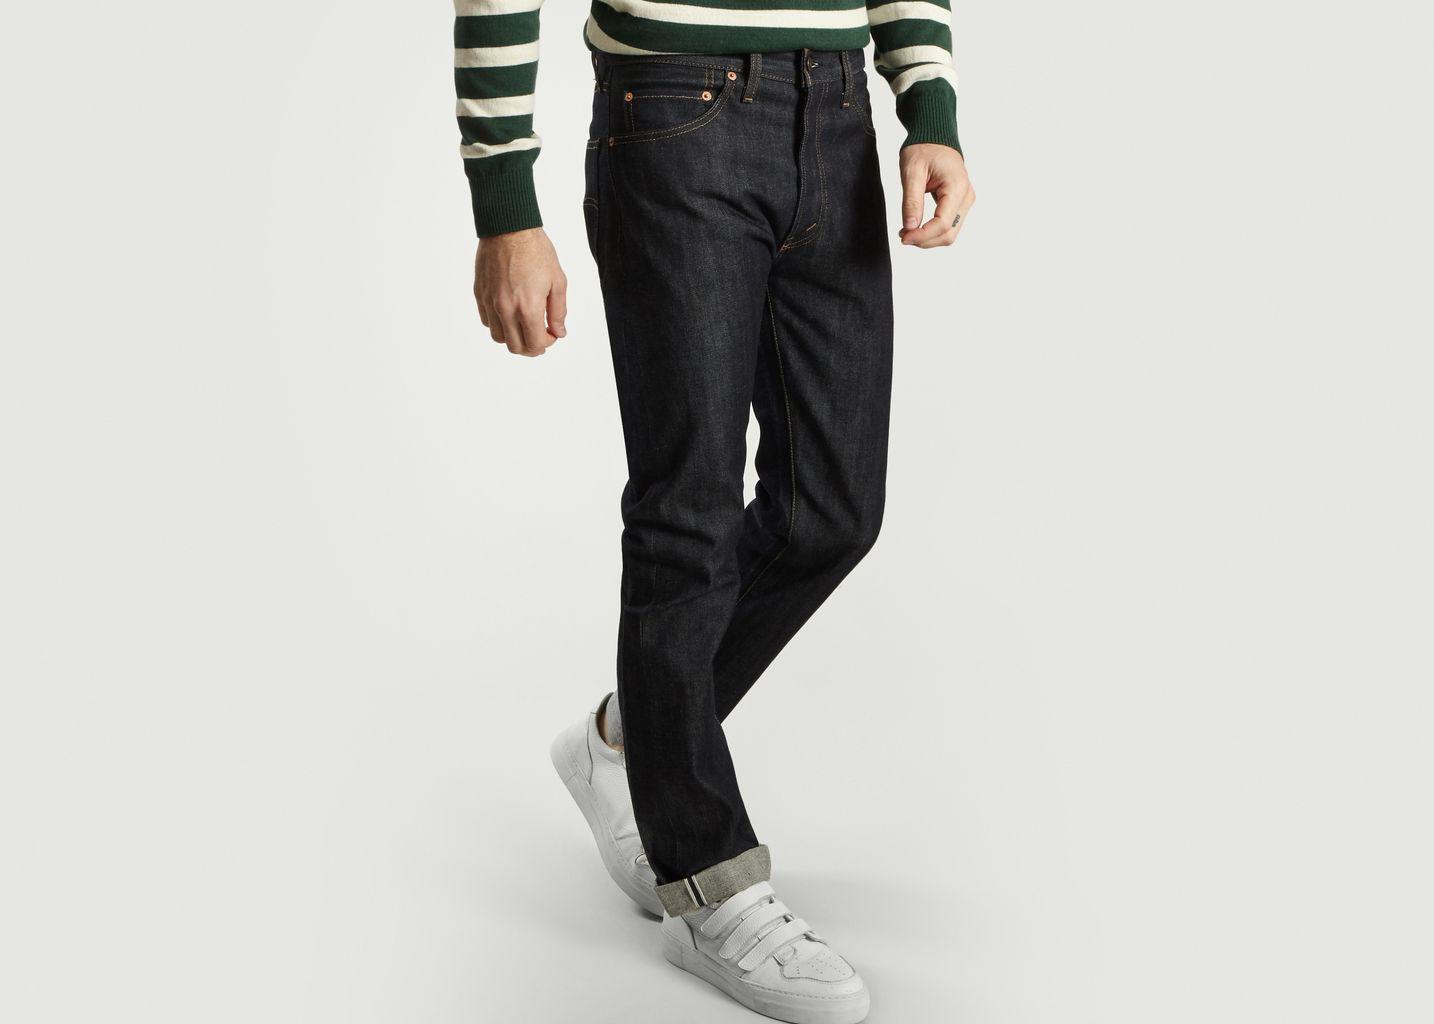 Jean 1967 505 selvedge - Levi's Vintage Clothing